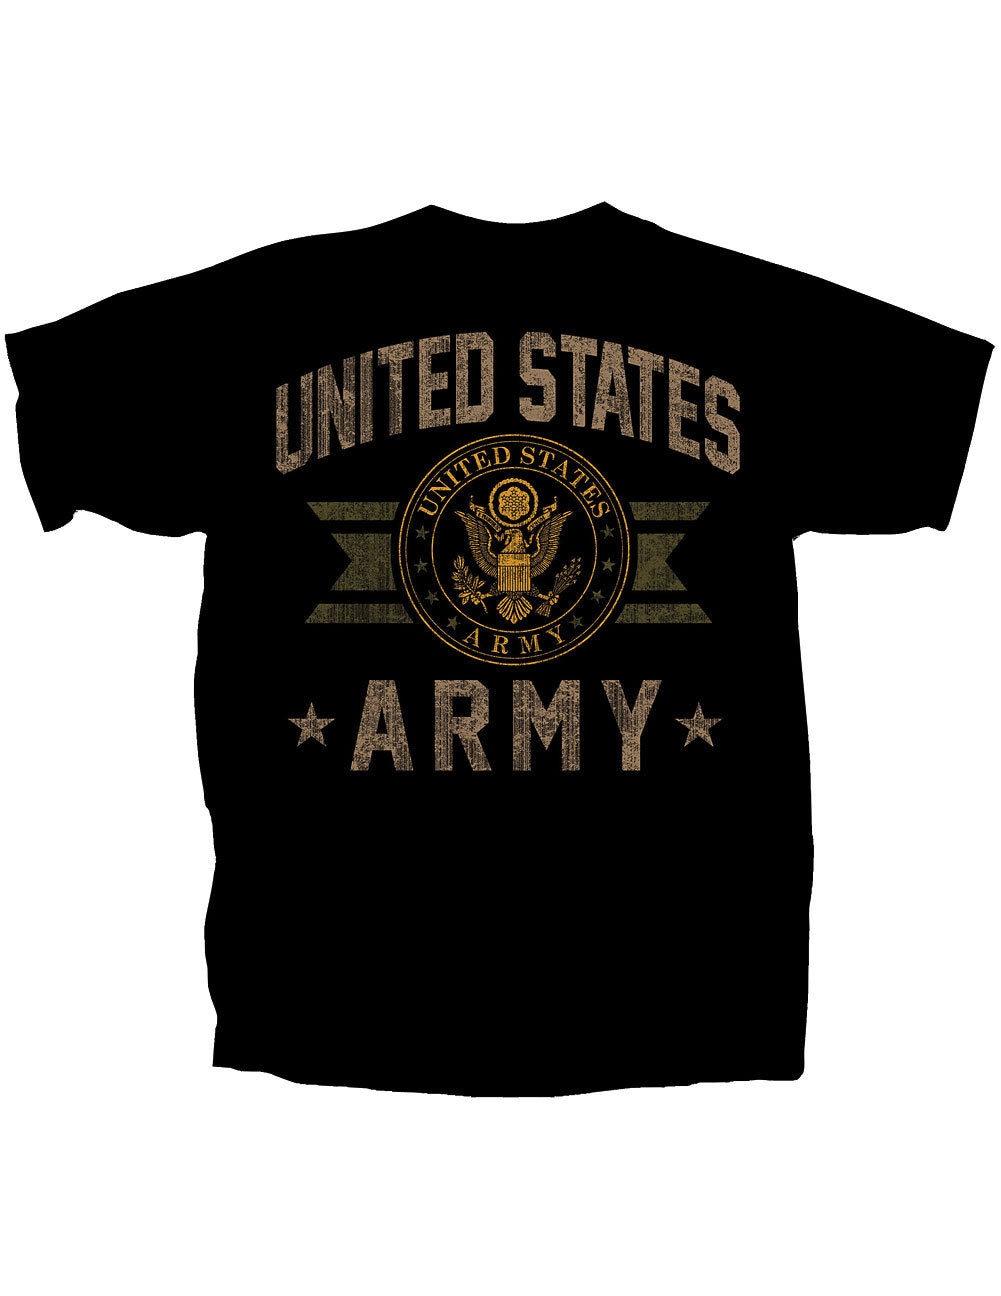 2019 verano Cool camiseta nueva NWT ejército orgullo militar Camiseta con bolsillo-licencia oficial x-large camiseta divertida